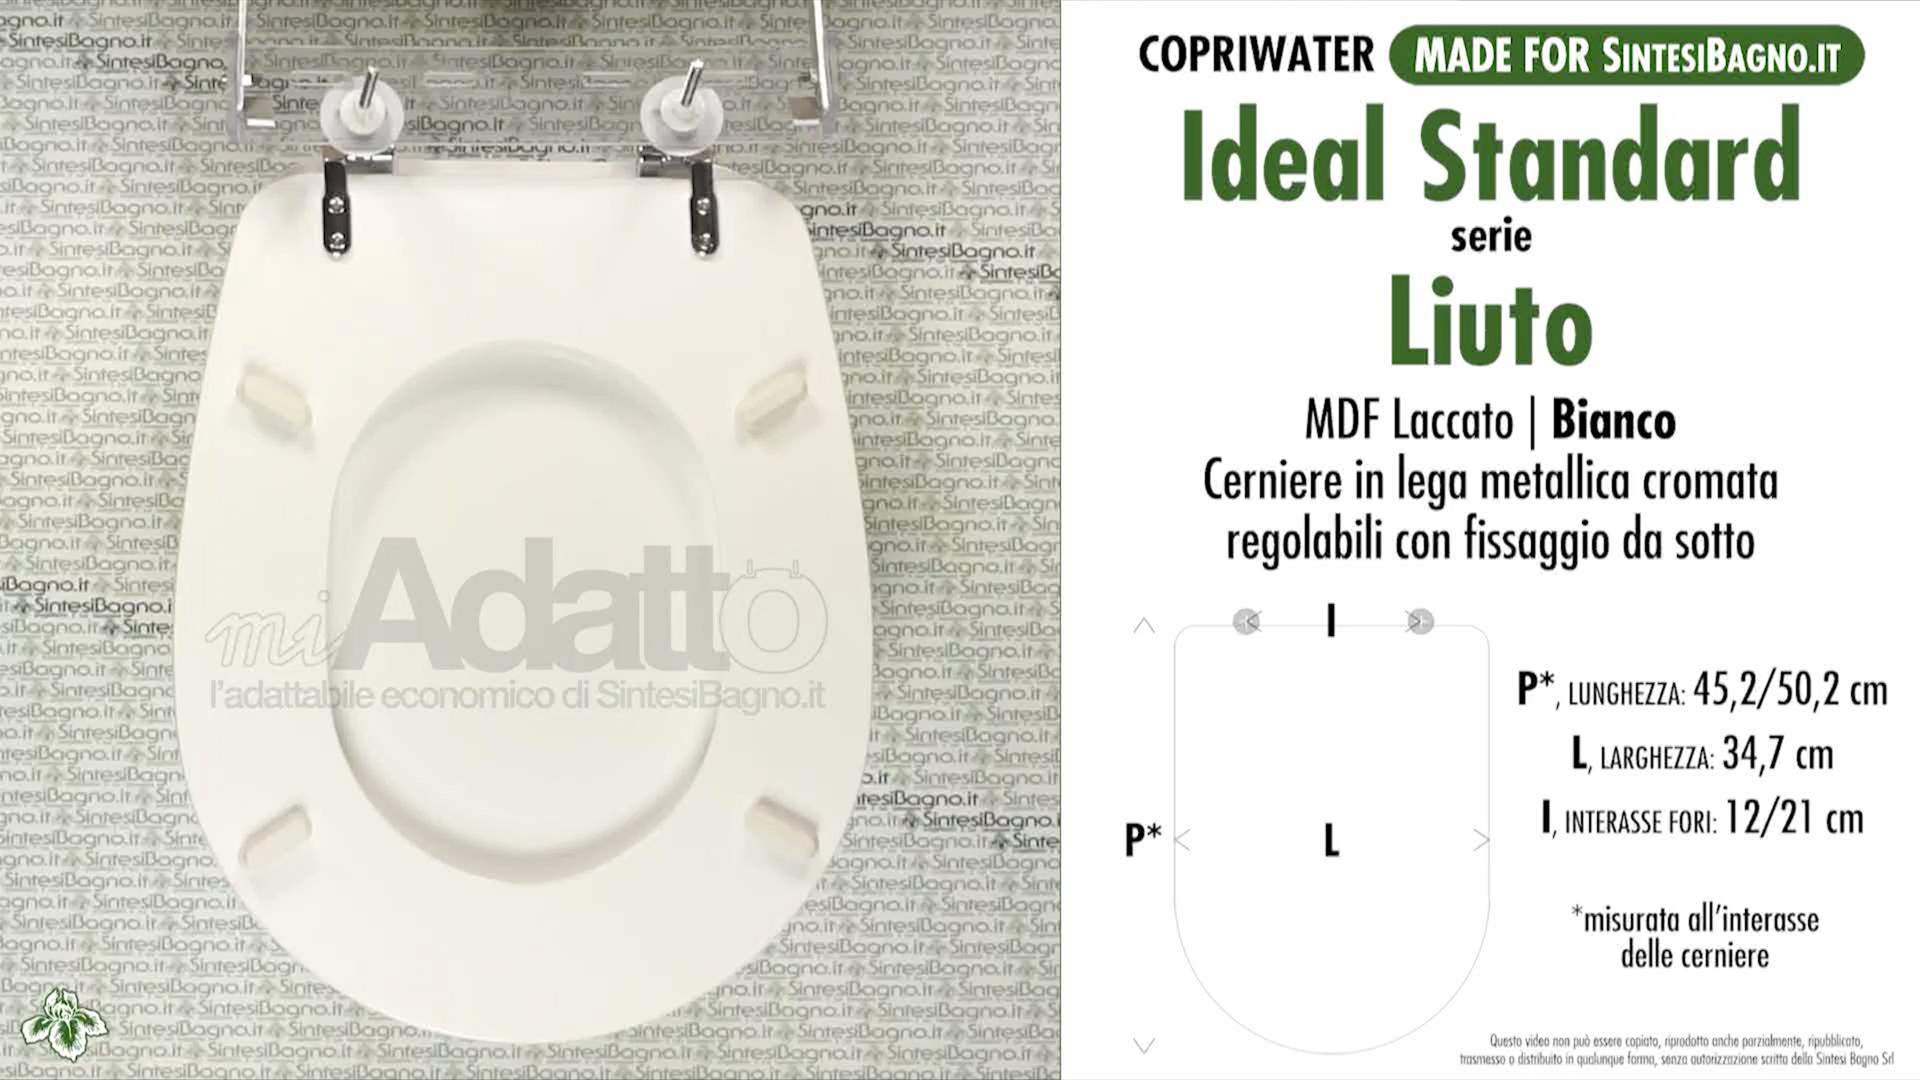 Copriwater per wc liuto ideal standard bianco tipo for Copriwater conca ideal standard originale